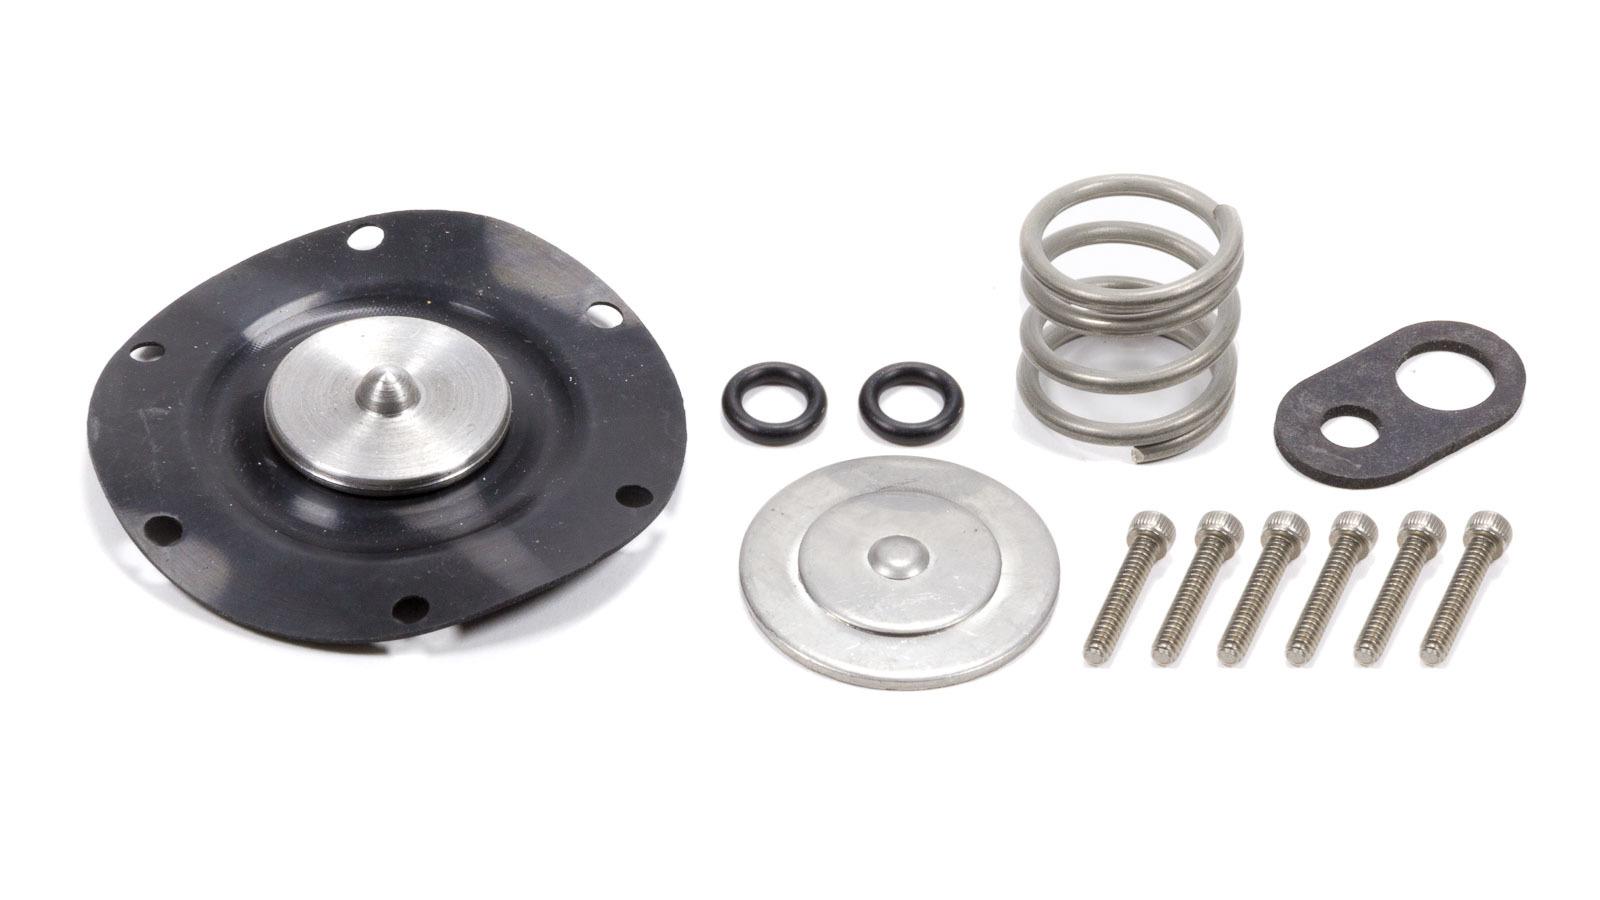 Bbk Performance Rebuild Kit - BBK Fuel Regulator